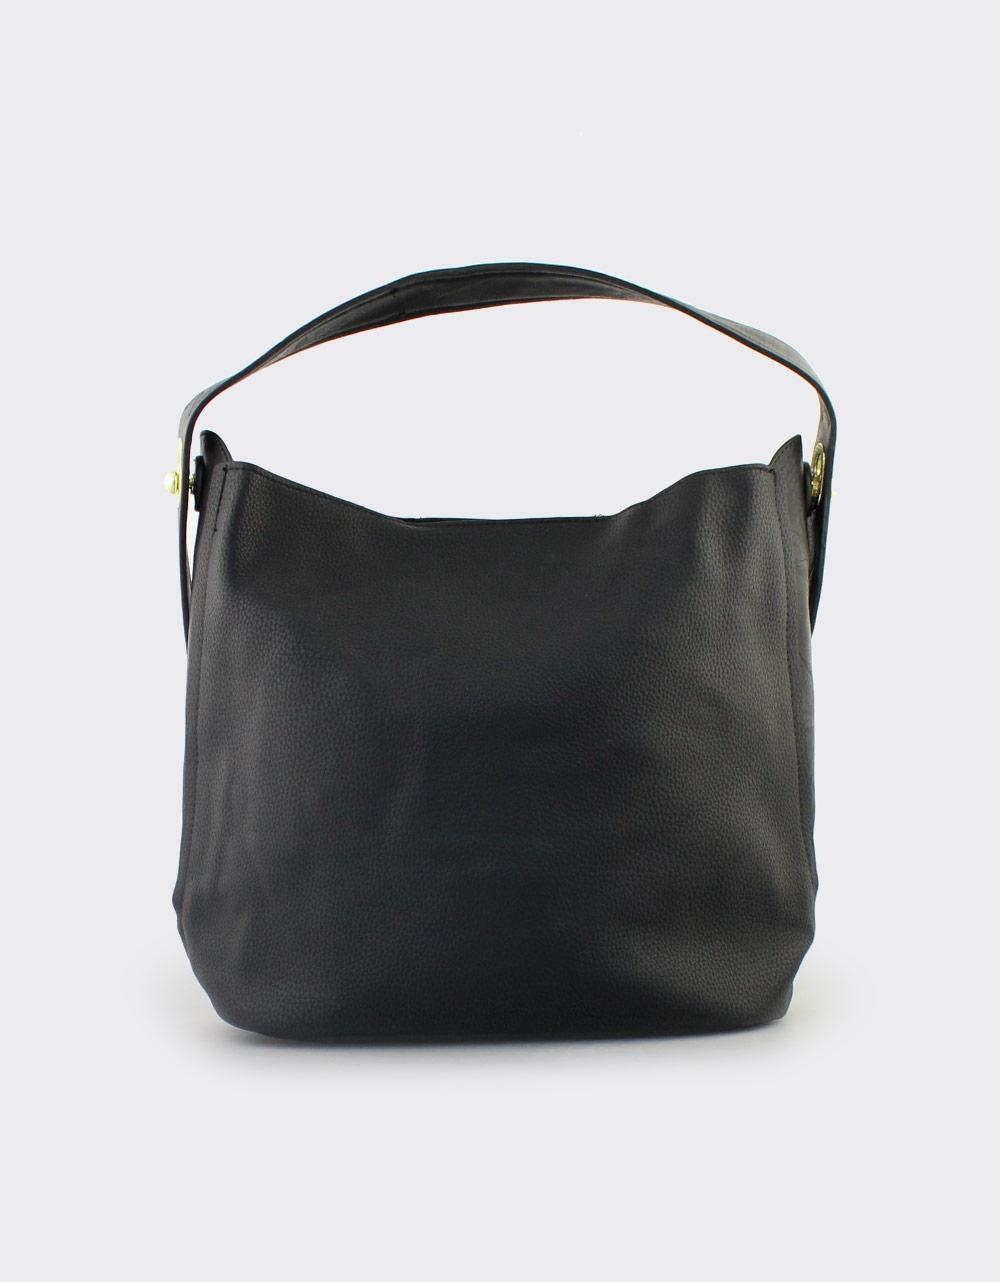 c7704165c7 Εικόνα από Γυναικείες τσάντες ώμου με εσωτερικό τσαντάκι Μαύρο